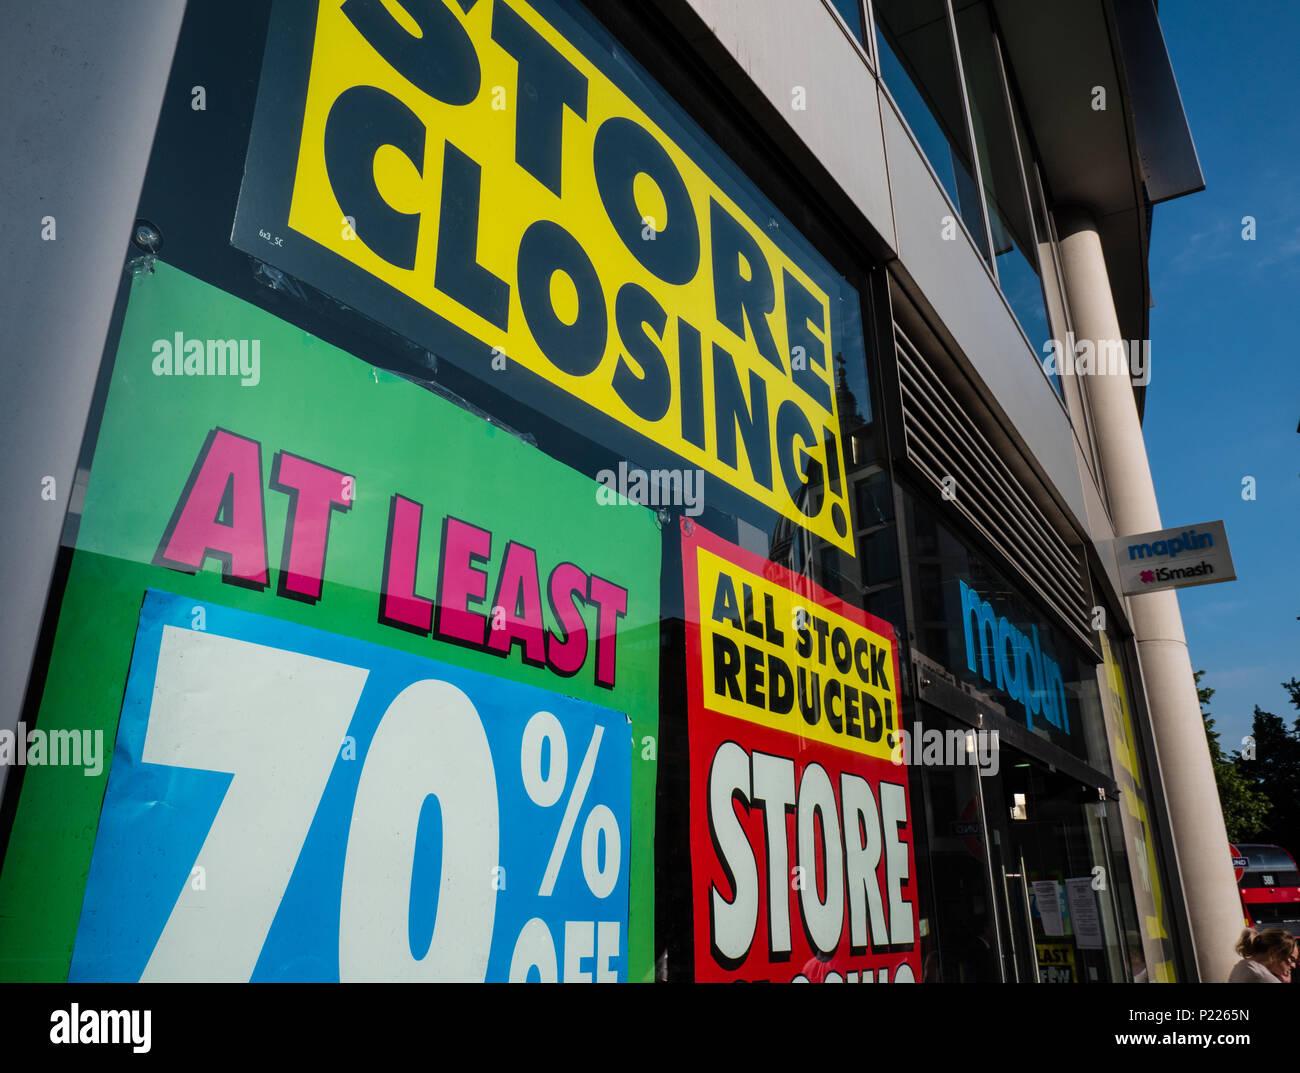 Maplin's Electronic Store Closing Down, City of London, London, England, UK, GB. - Stock Image